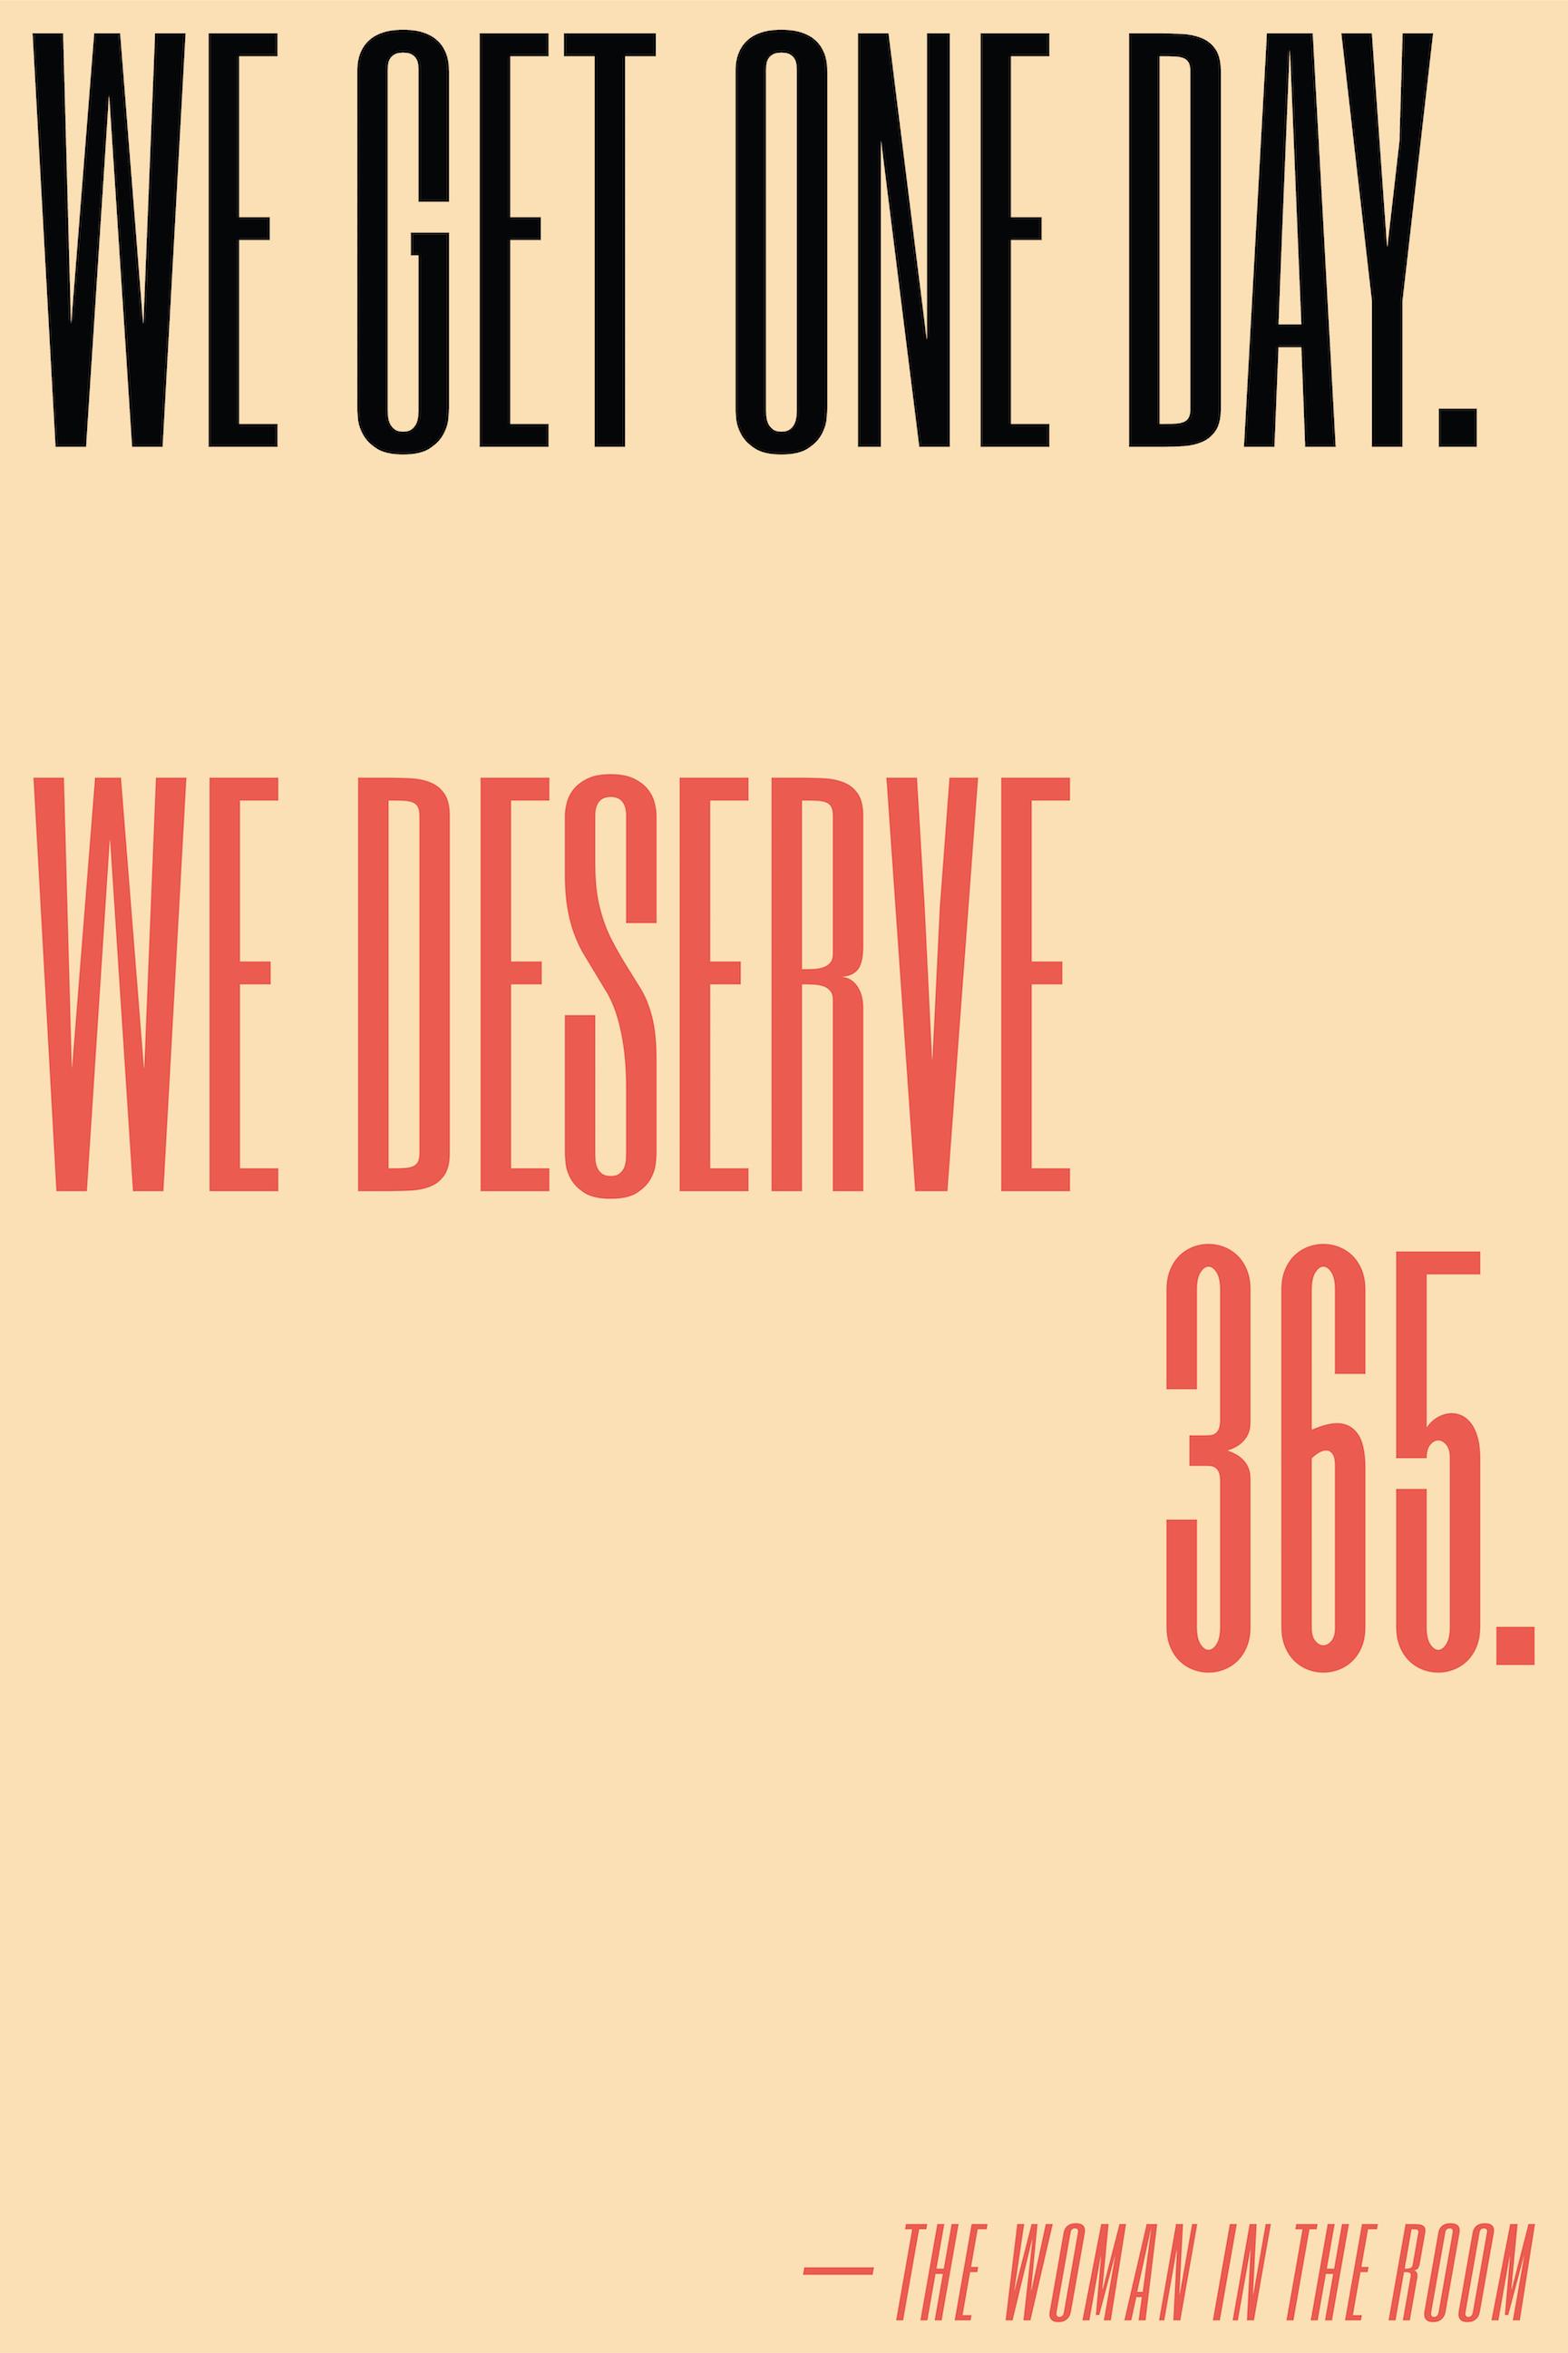 We get one day. We deserve 365.